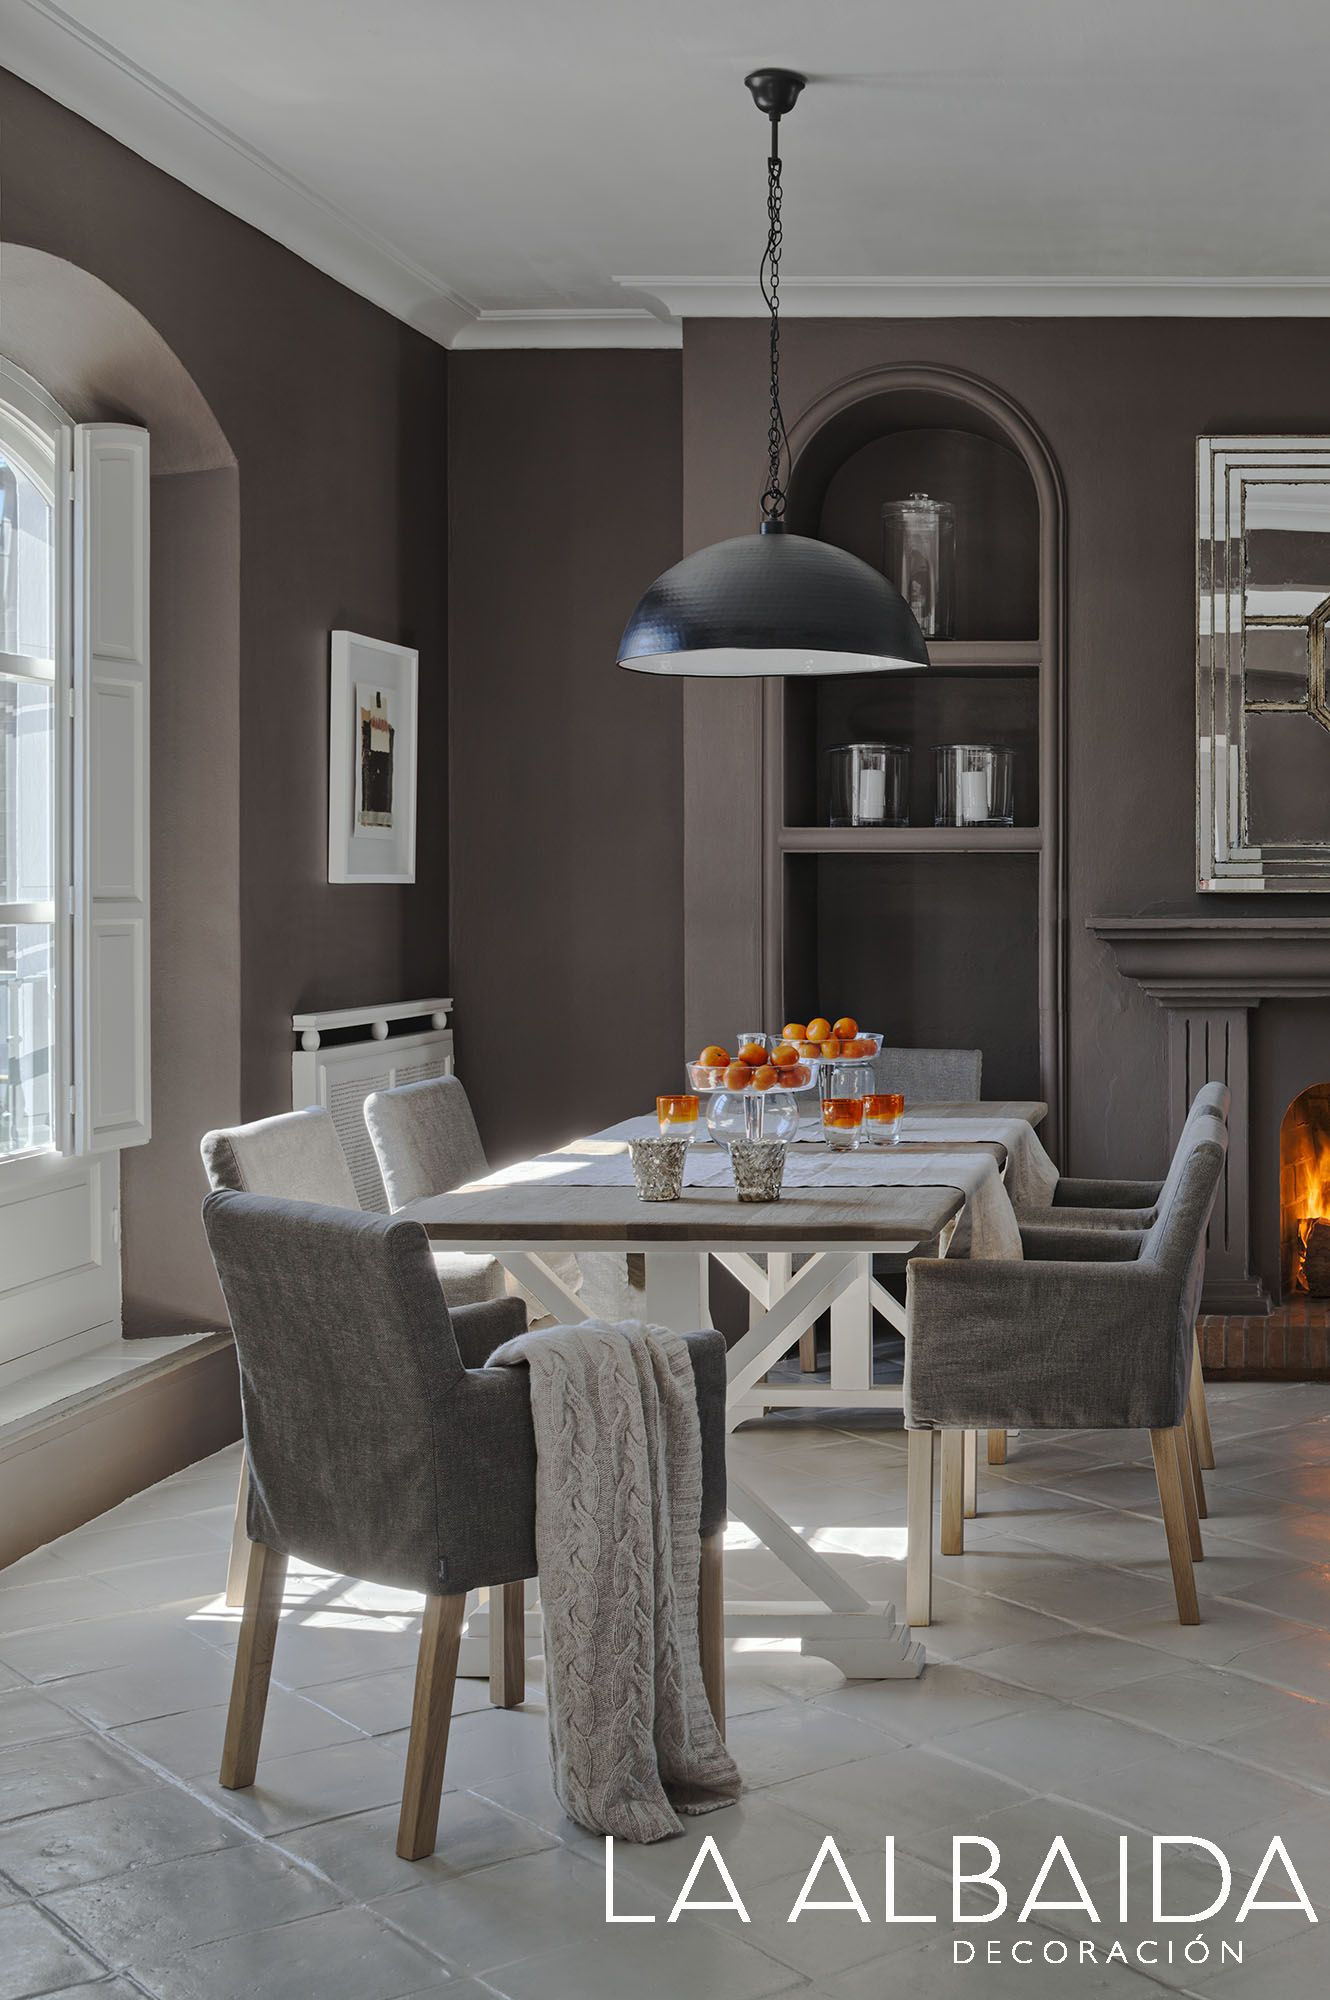 clays piastrelle in ceramica marazzi_6624   architecture ... - Zauberhafte Grey Goose Bar